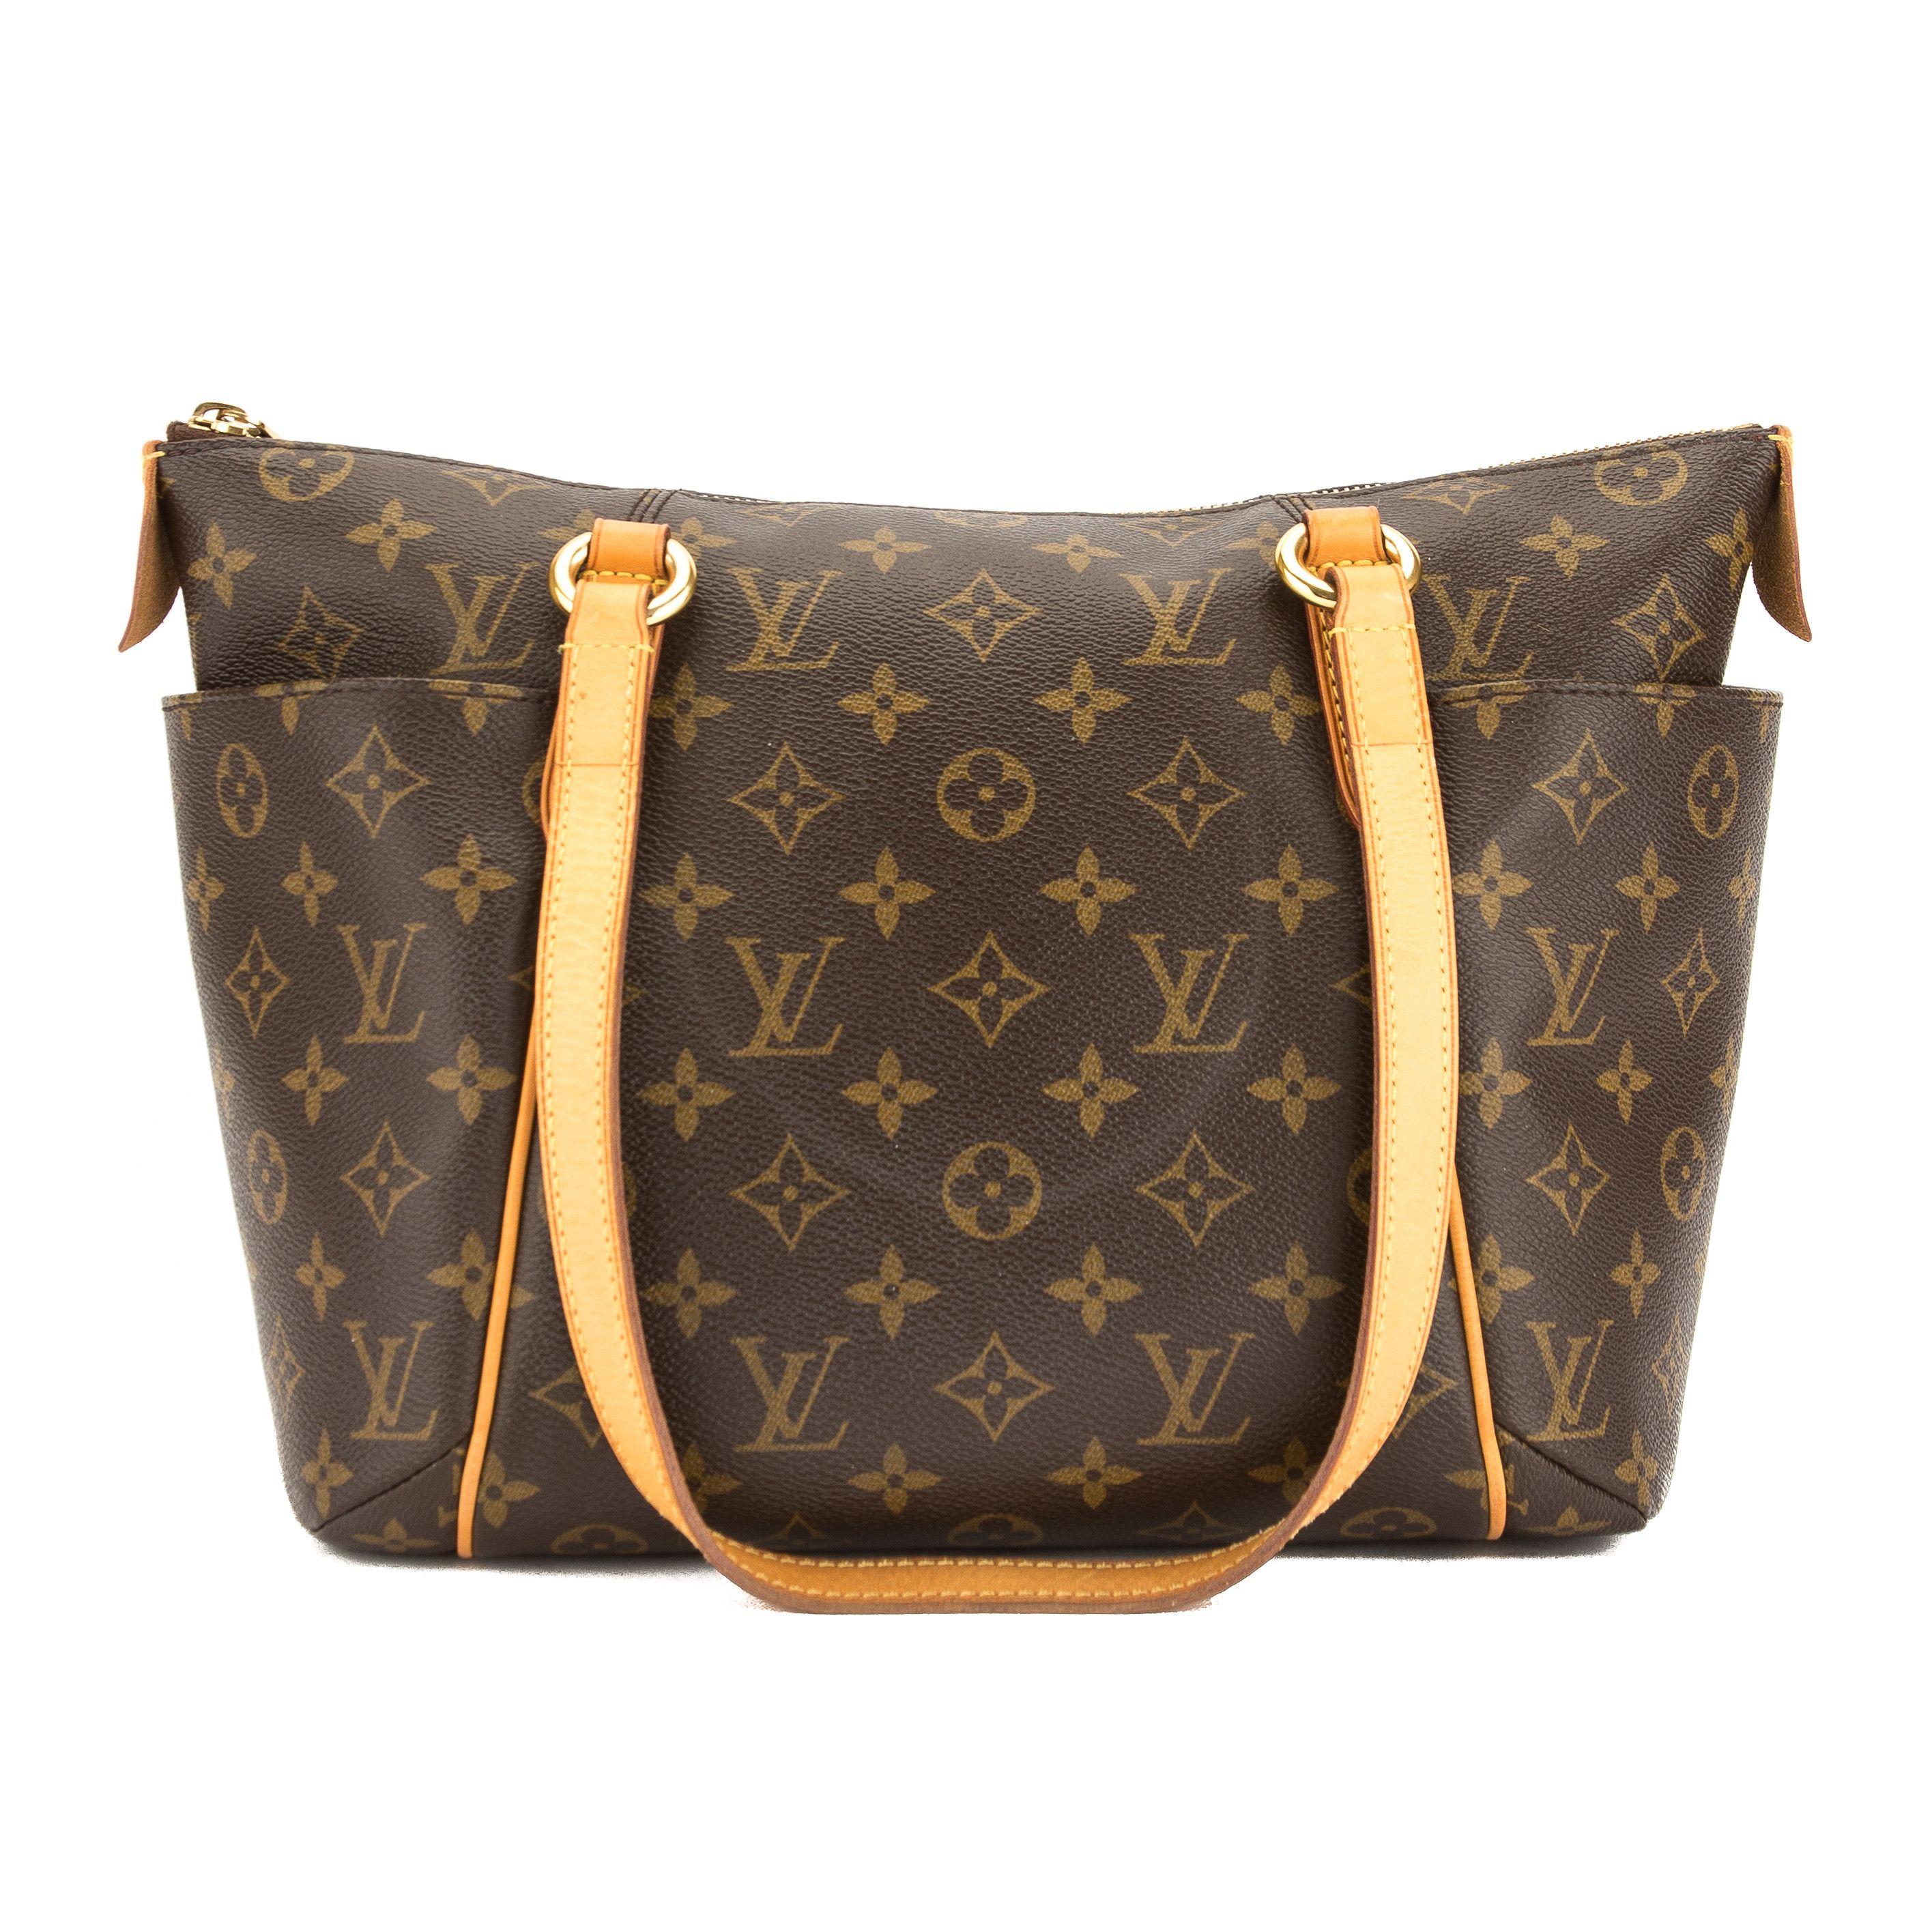 b4291839a523 Louis Vuitton Monogram Canvas Totally PM Bag (Pre Owned) - 3603019